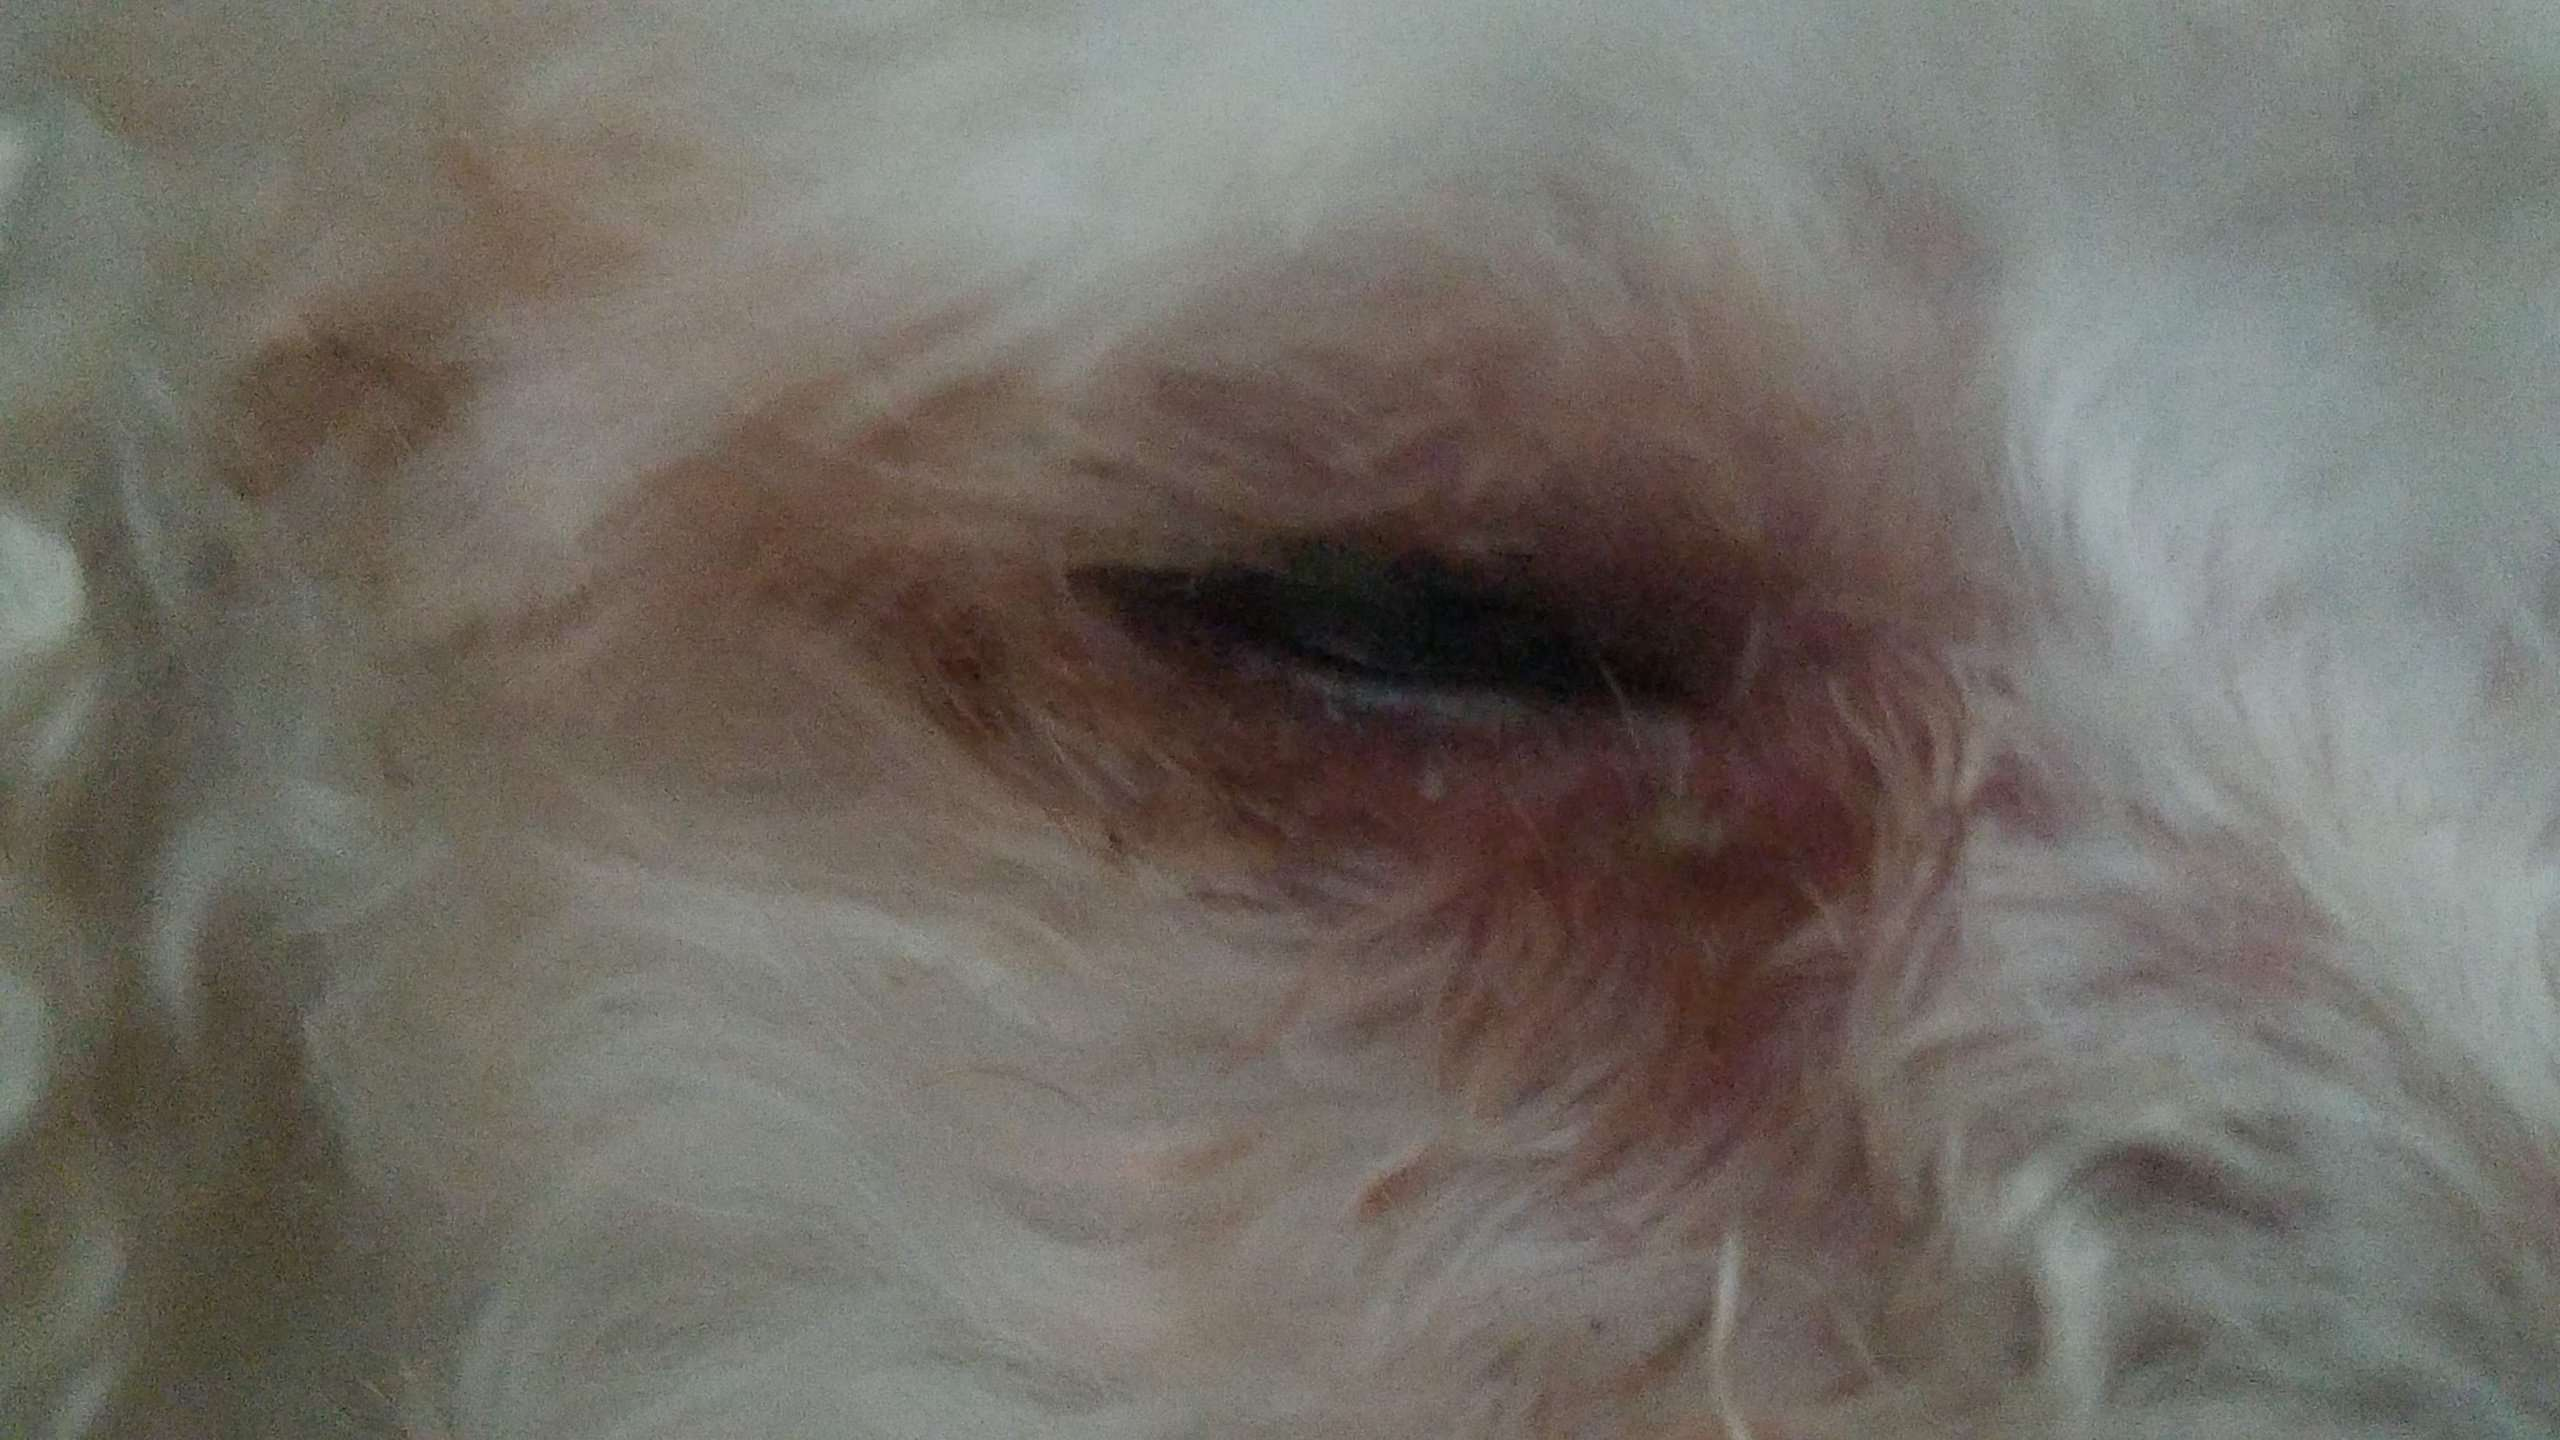 Kenzo Eye 20190703 tear staining